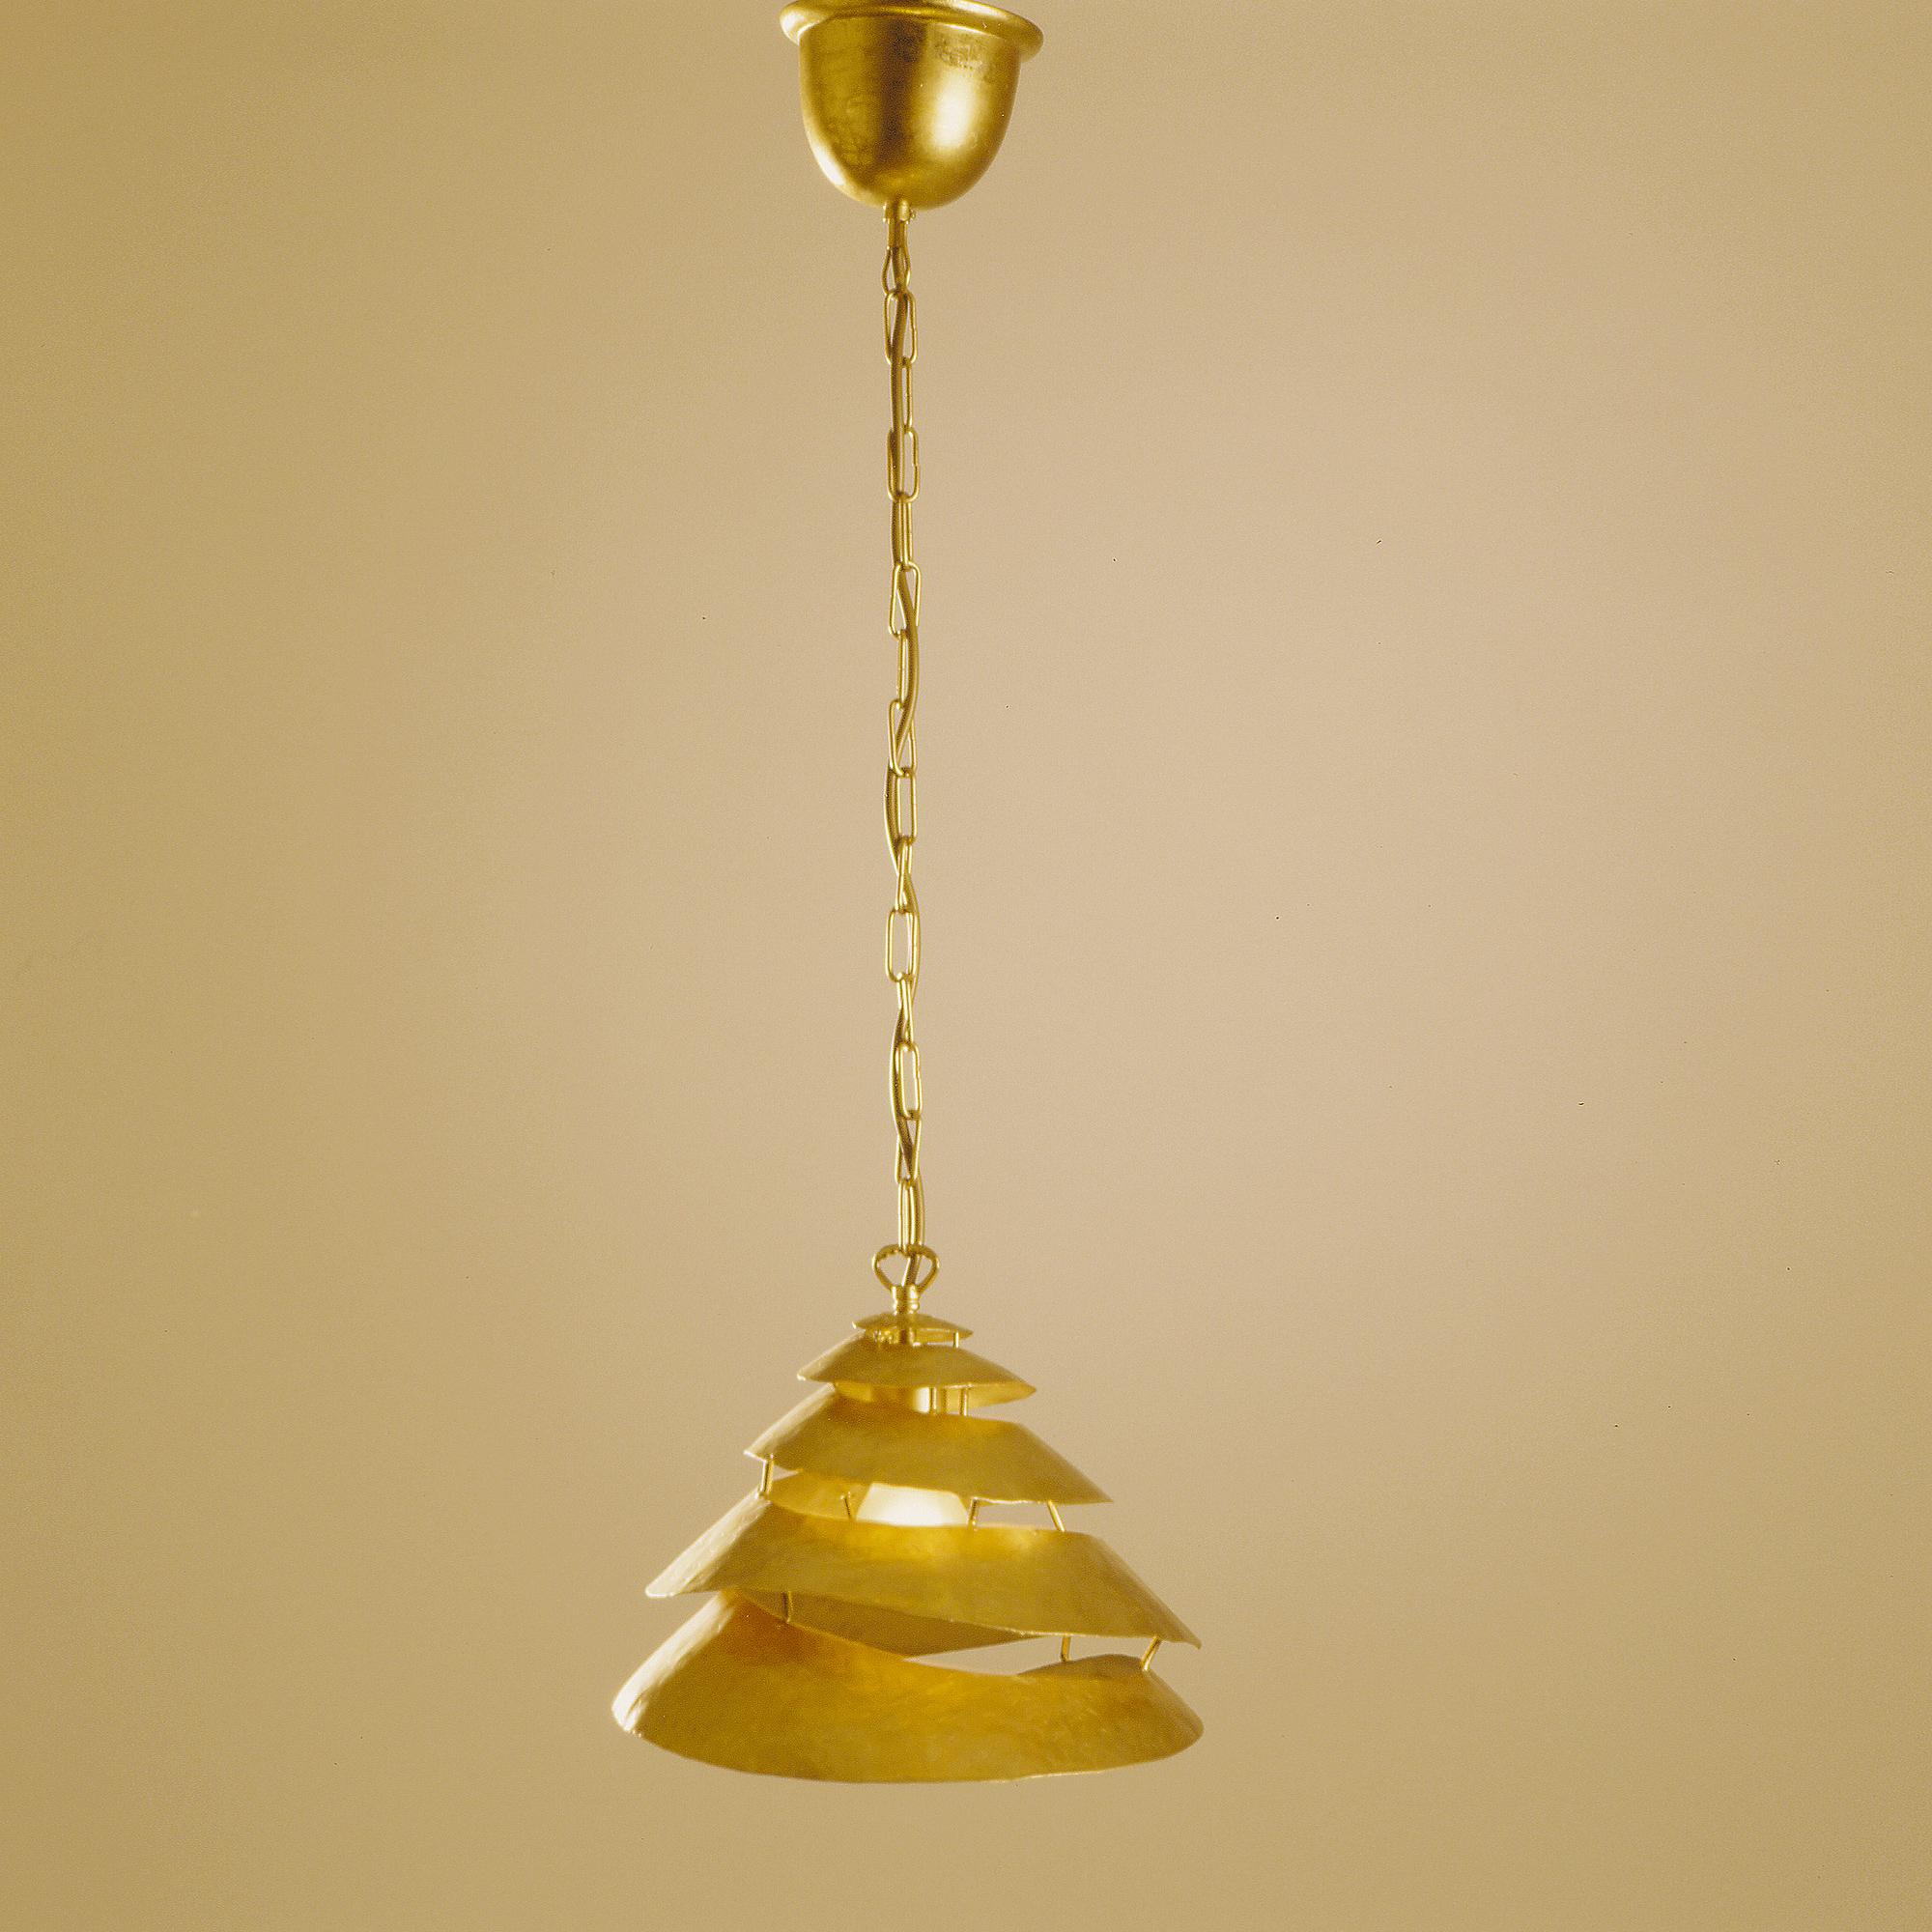 Pendant Light Snail 1-Light